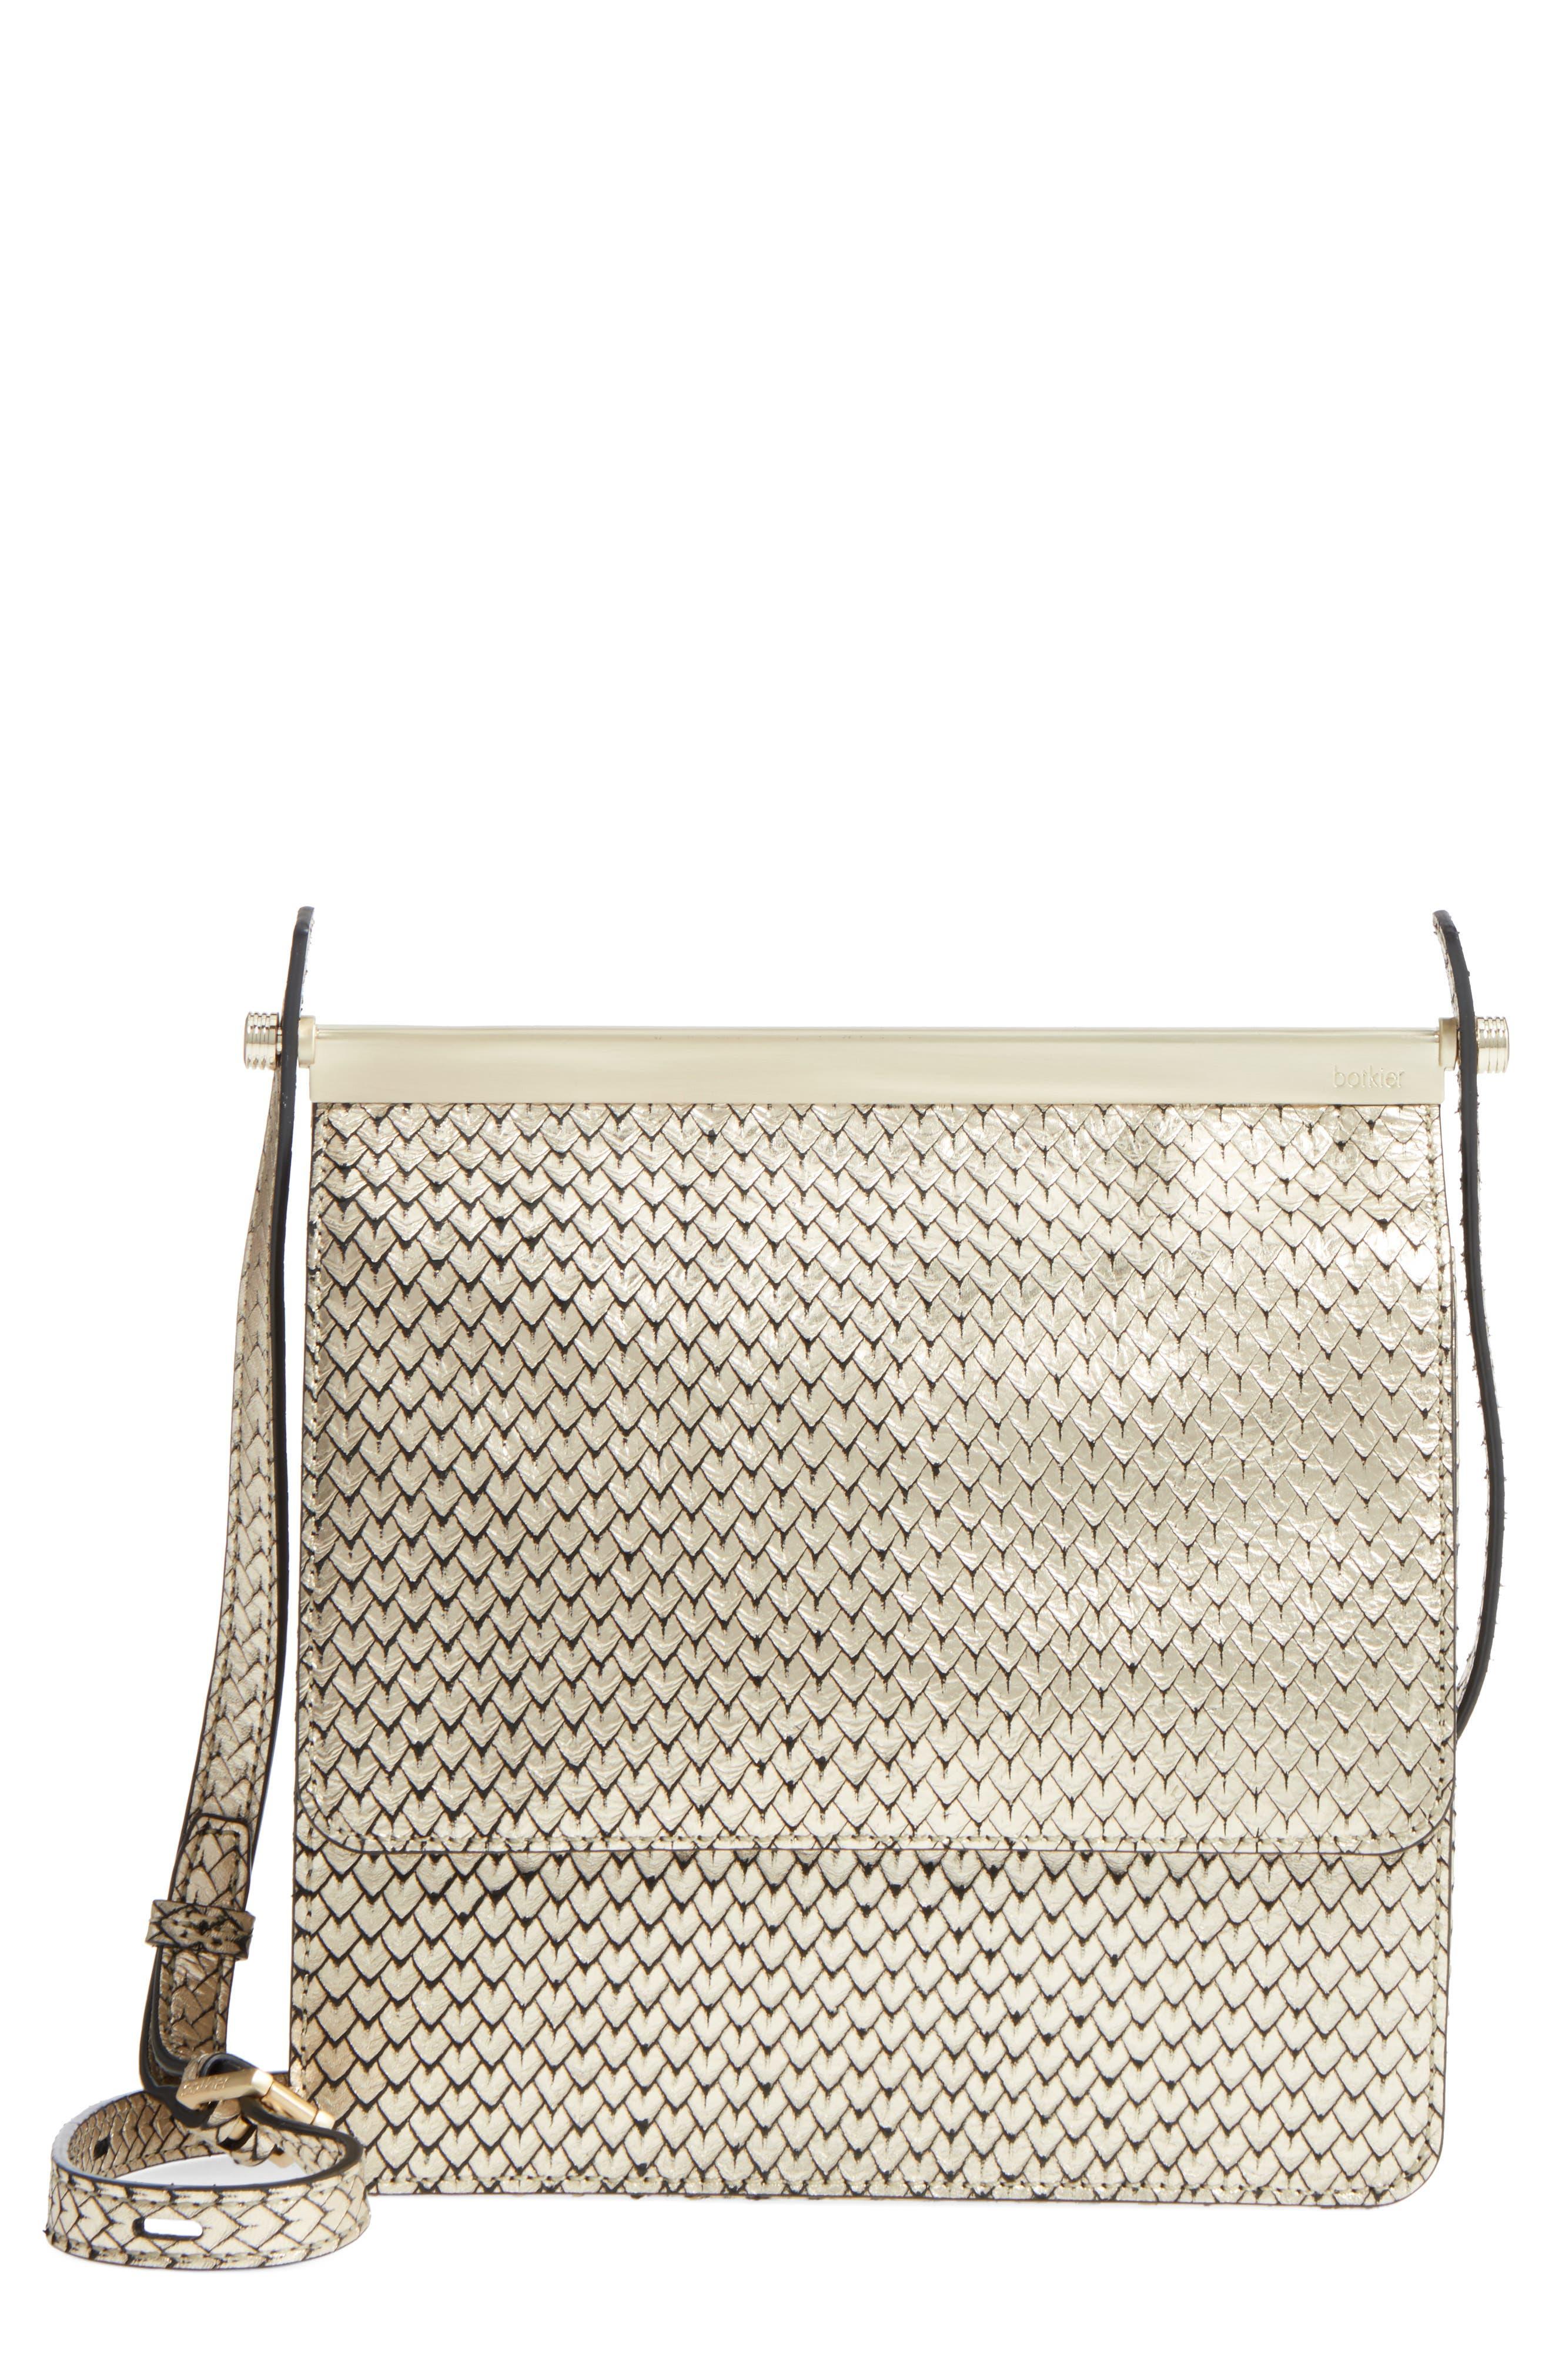 Crawford Calfskin Leather Crossbody Bag,                             Main thumbnail 1, color,                             Gold